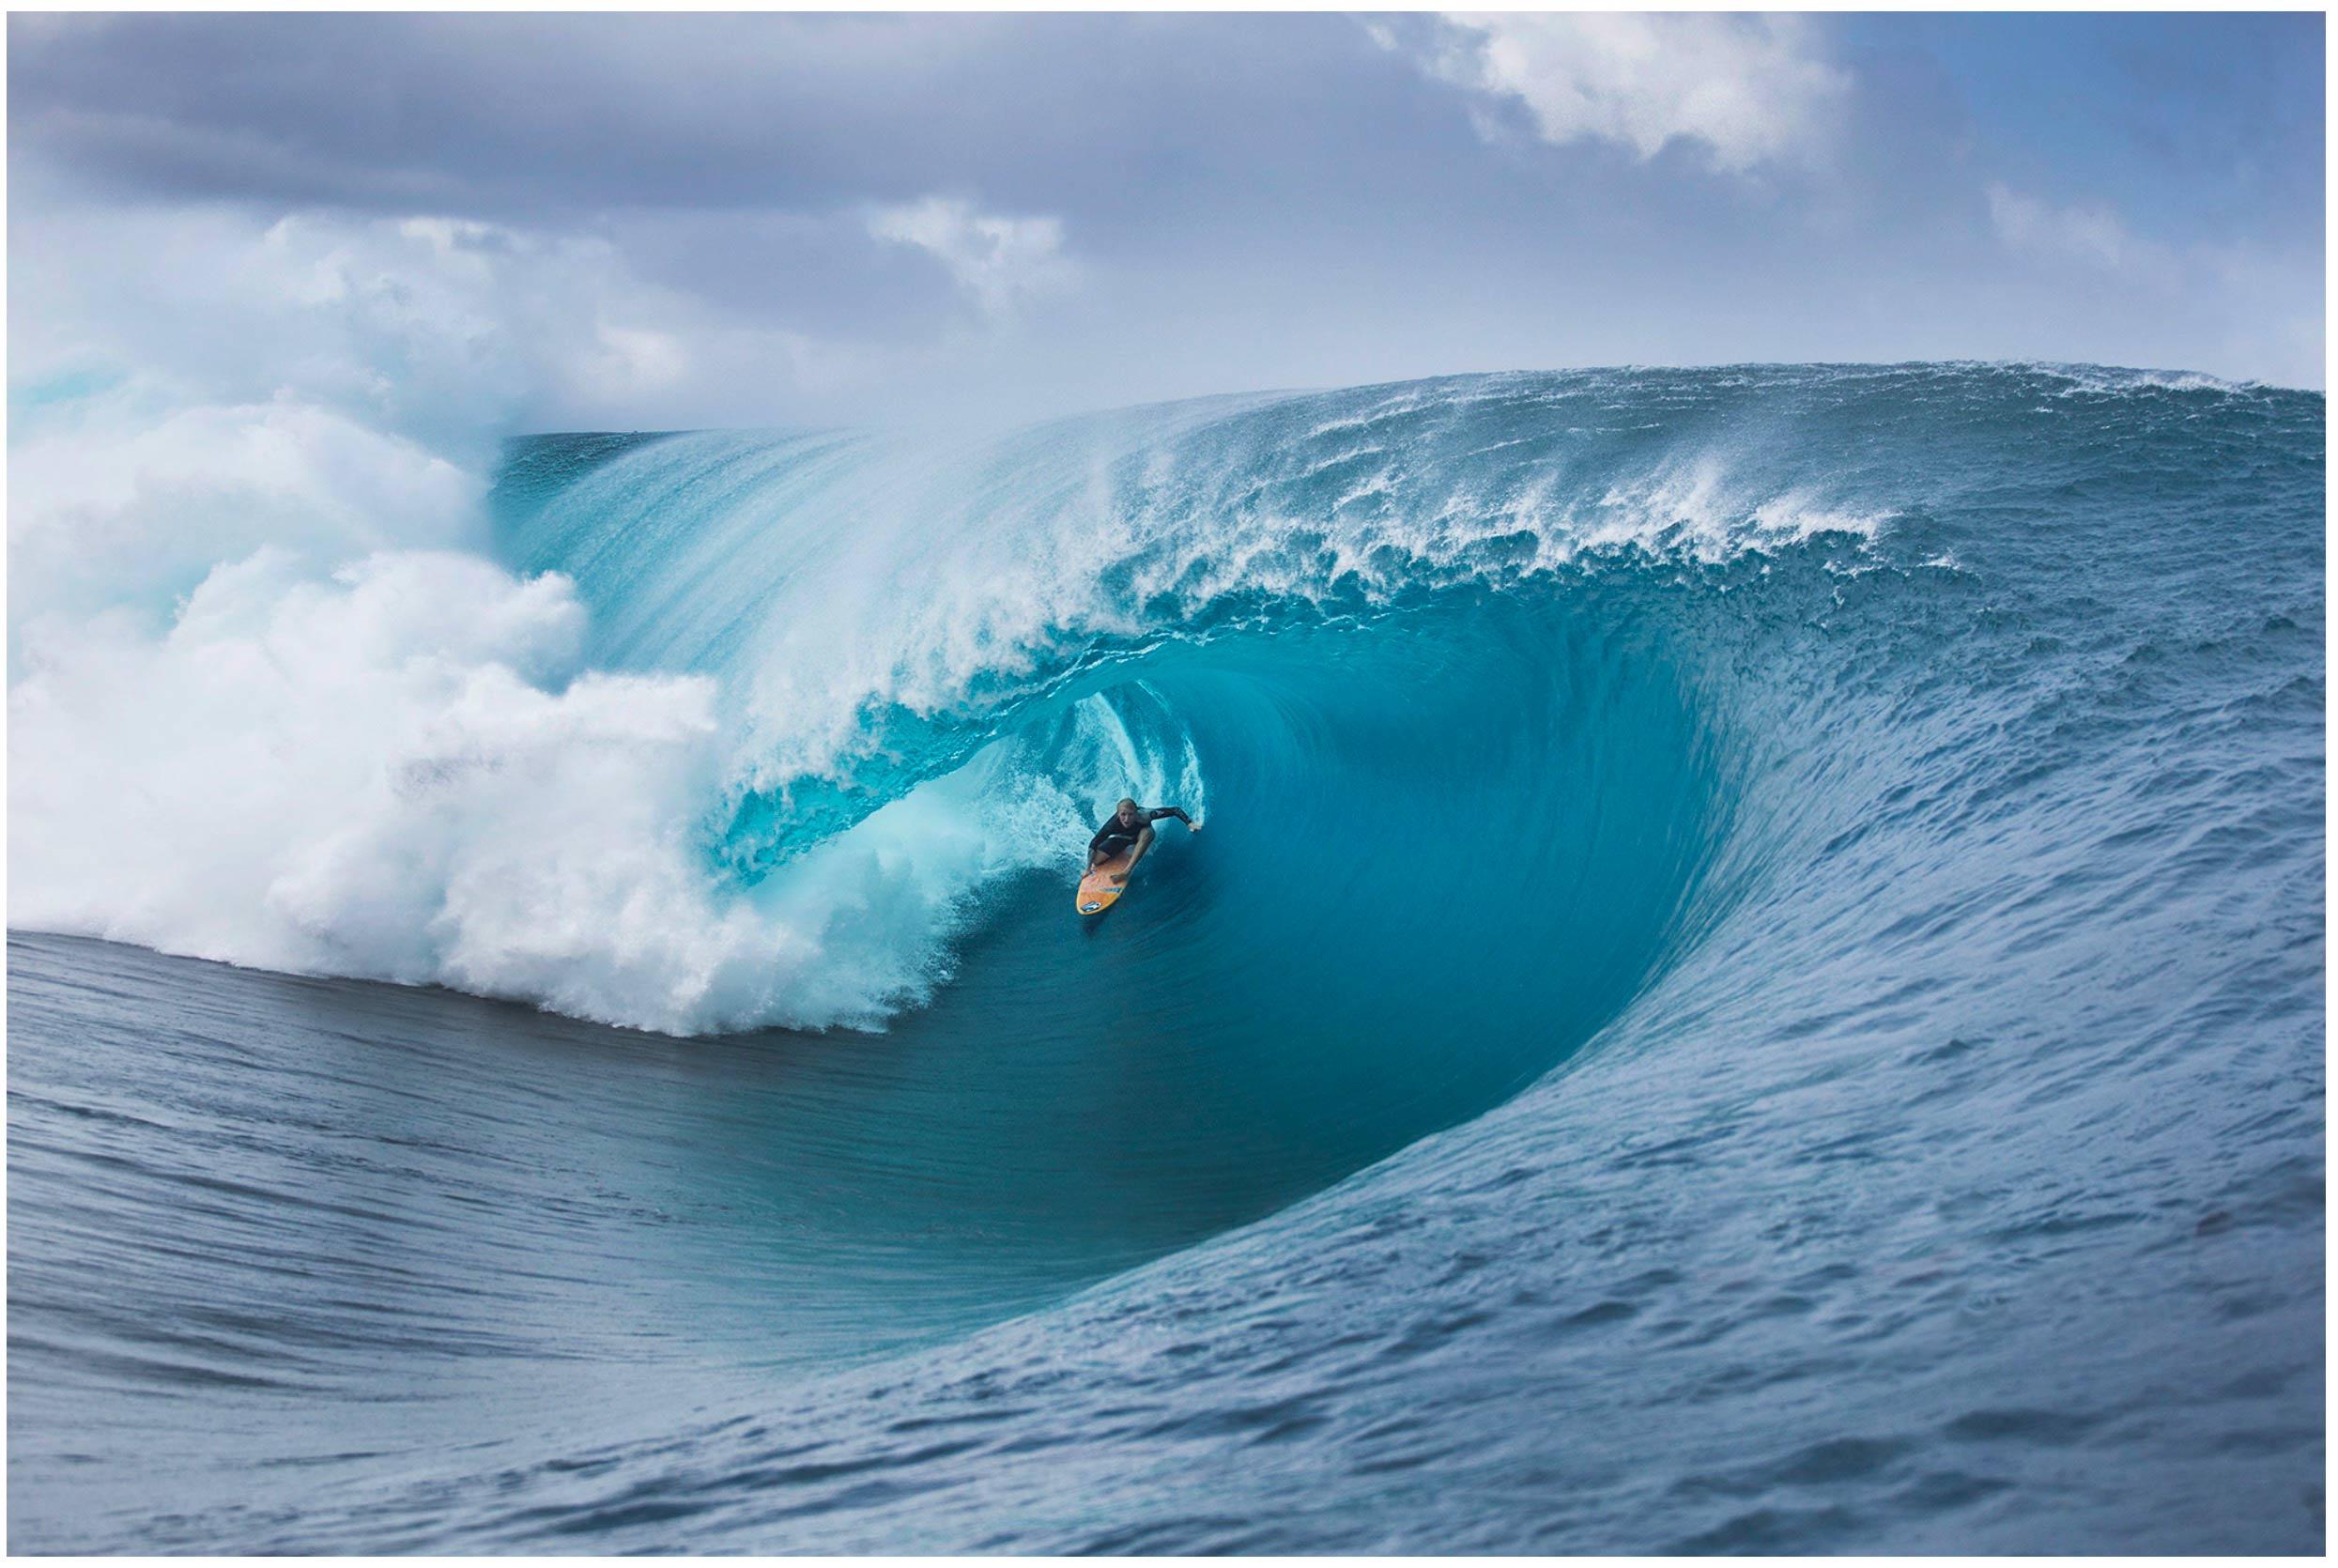 rodd-owen-surf-photography-for-sale-owenphoto-270.jpg